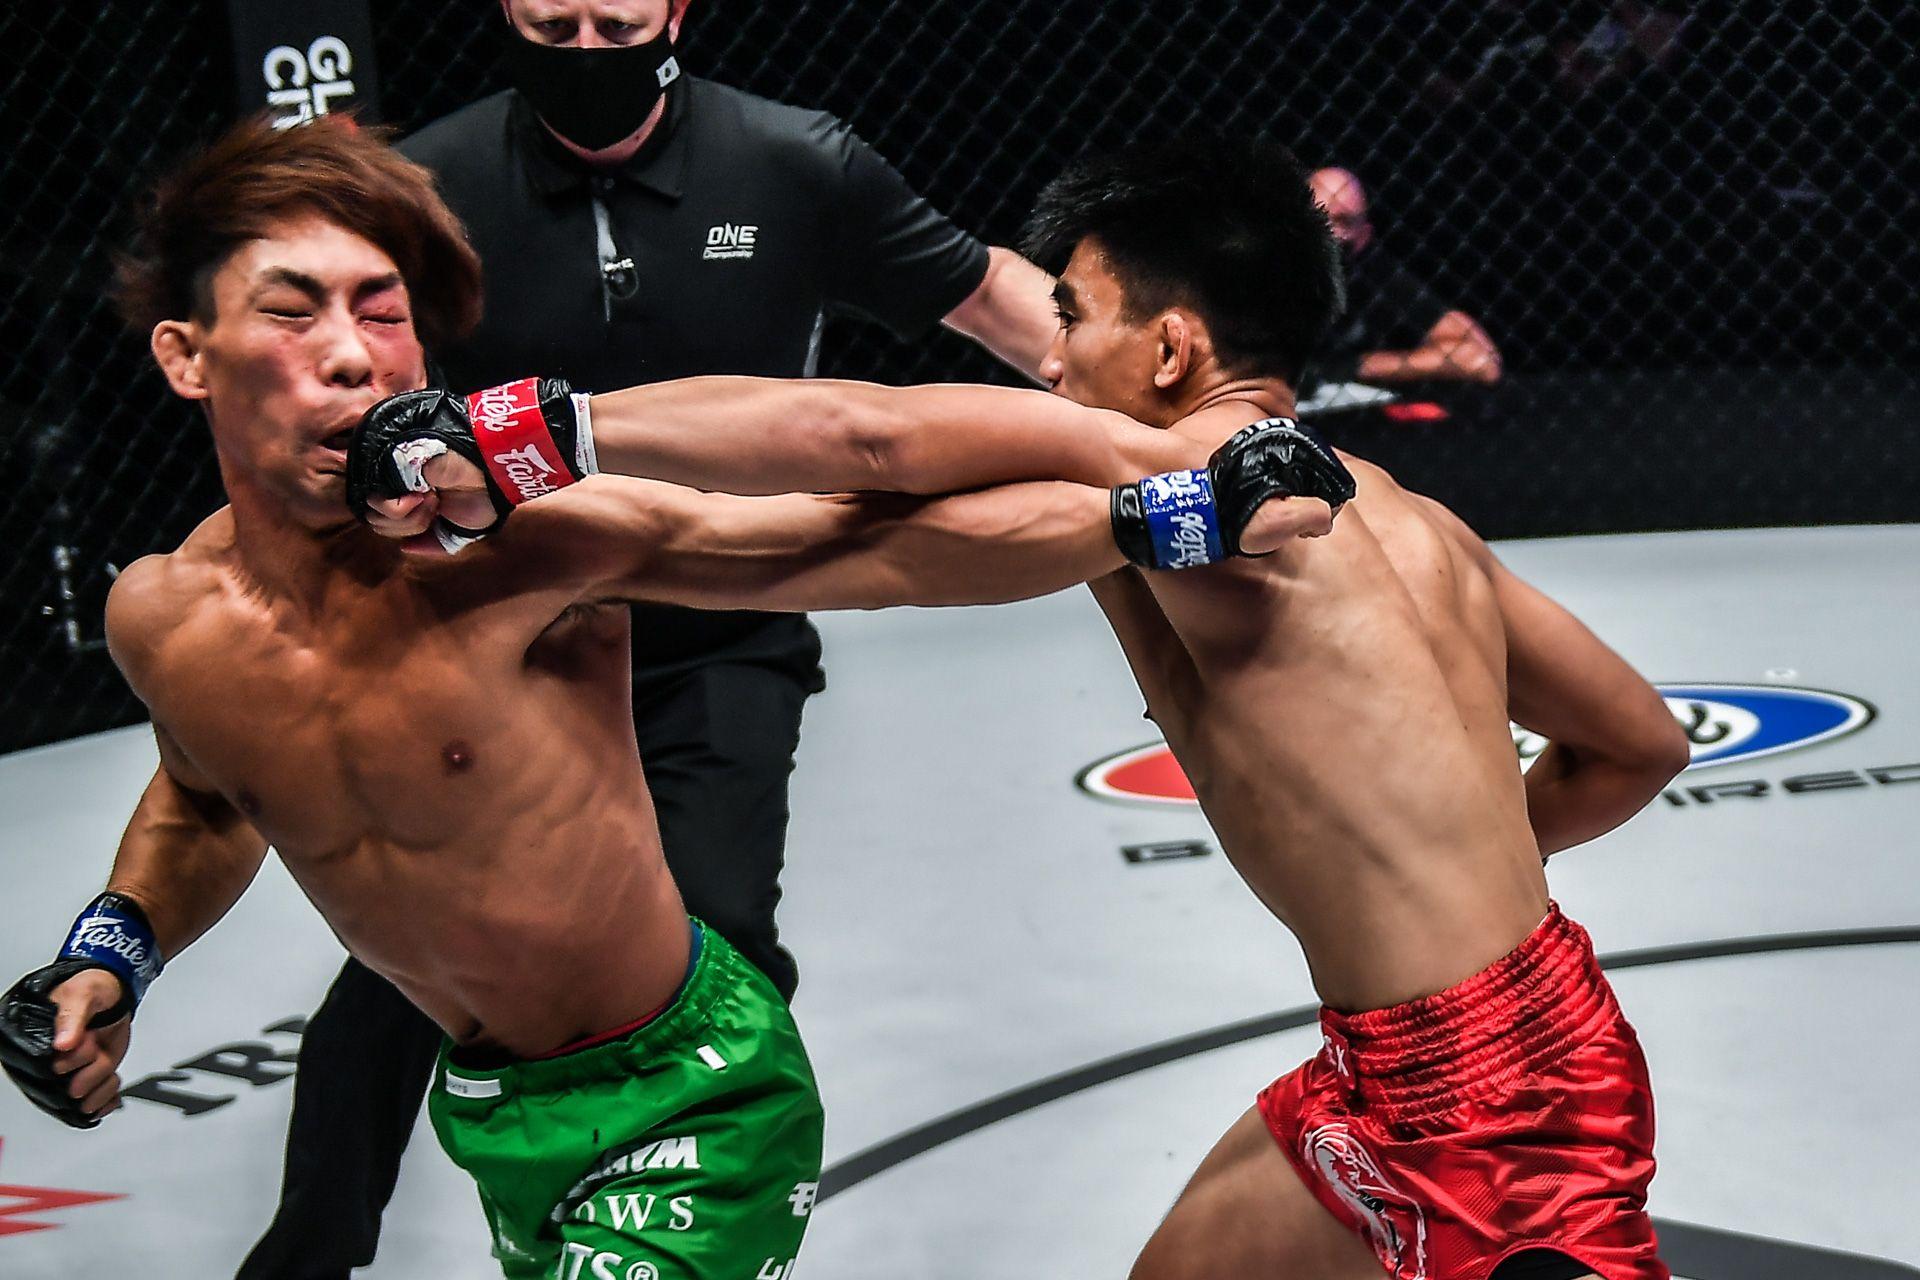 ONE-Revolution-Joshua-Pacio-straight-to-Yosuke-Saruta ONE: Revolution: Pacio puts emphatic end to Saruta rivalry Mixed Martial Arts News ONE Championship  - philippine sports news